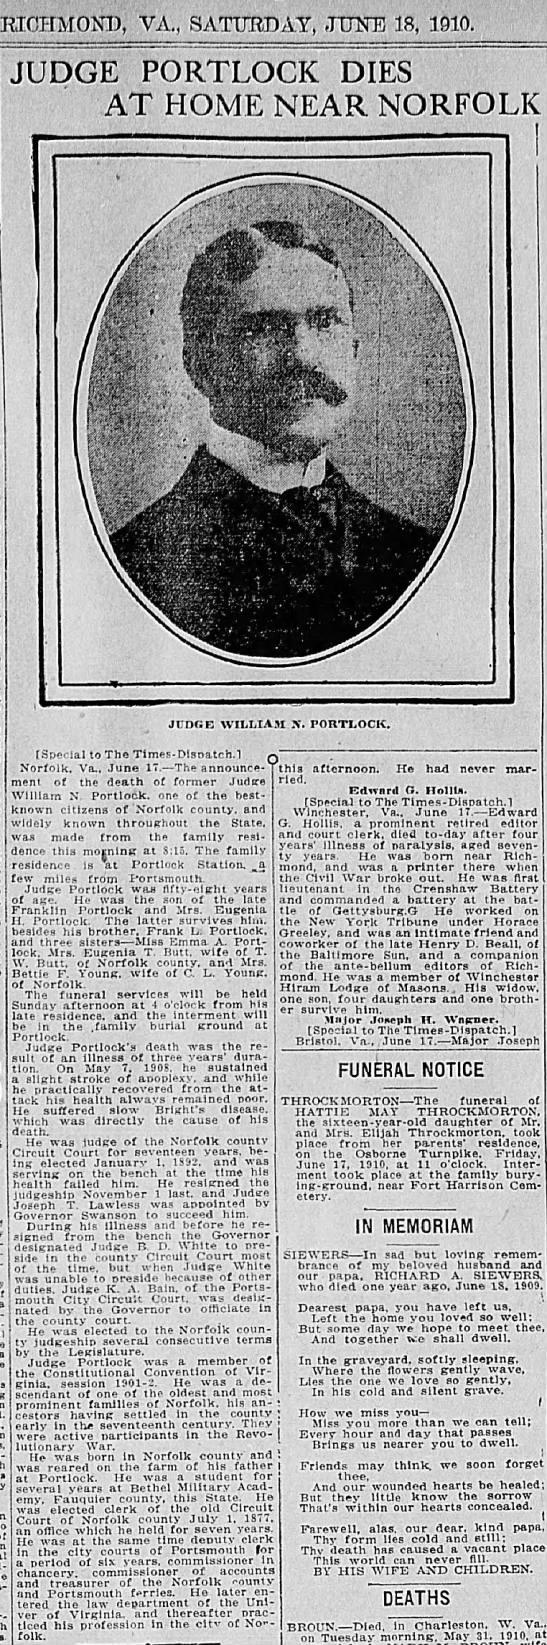 Portlock, Judge Wm Nathaniel;obit; The Times Disatrch, June 18, 1910, Sat. pg 3 -